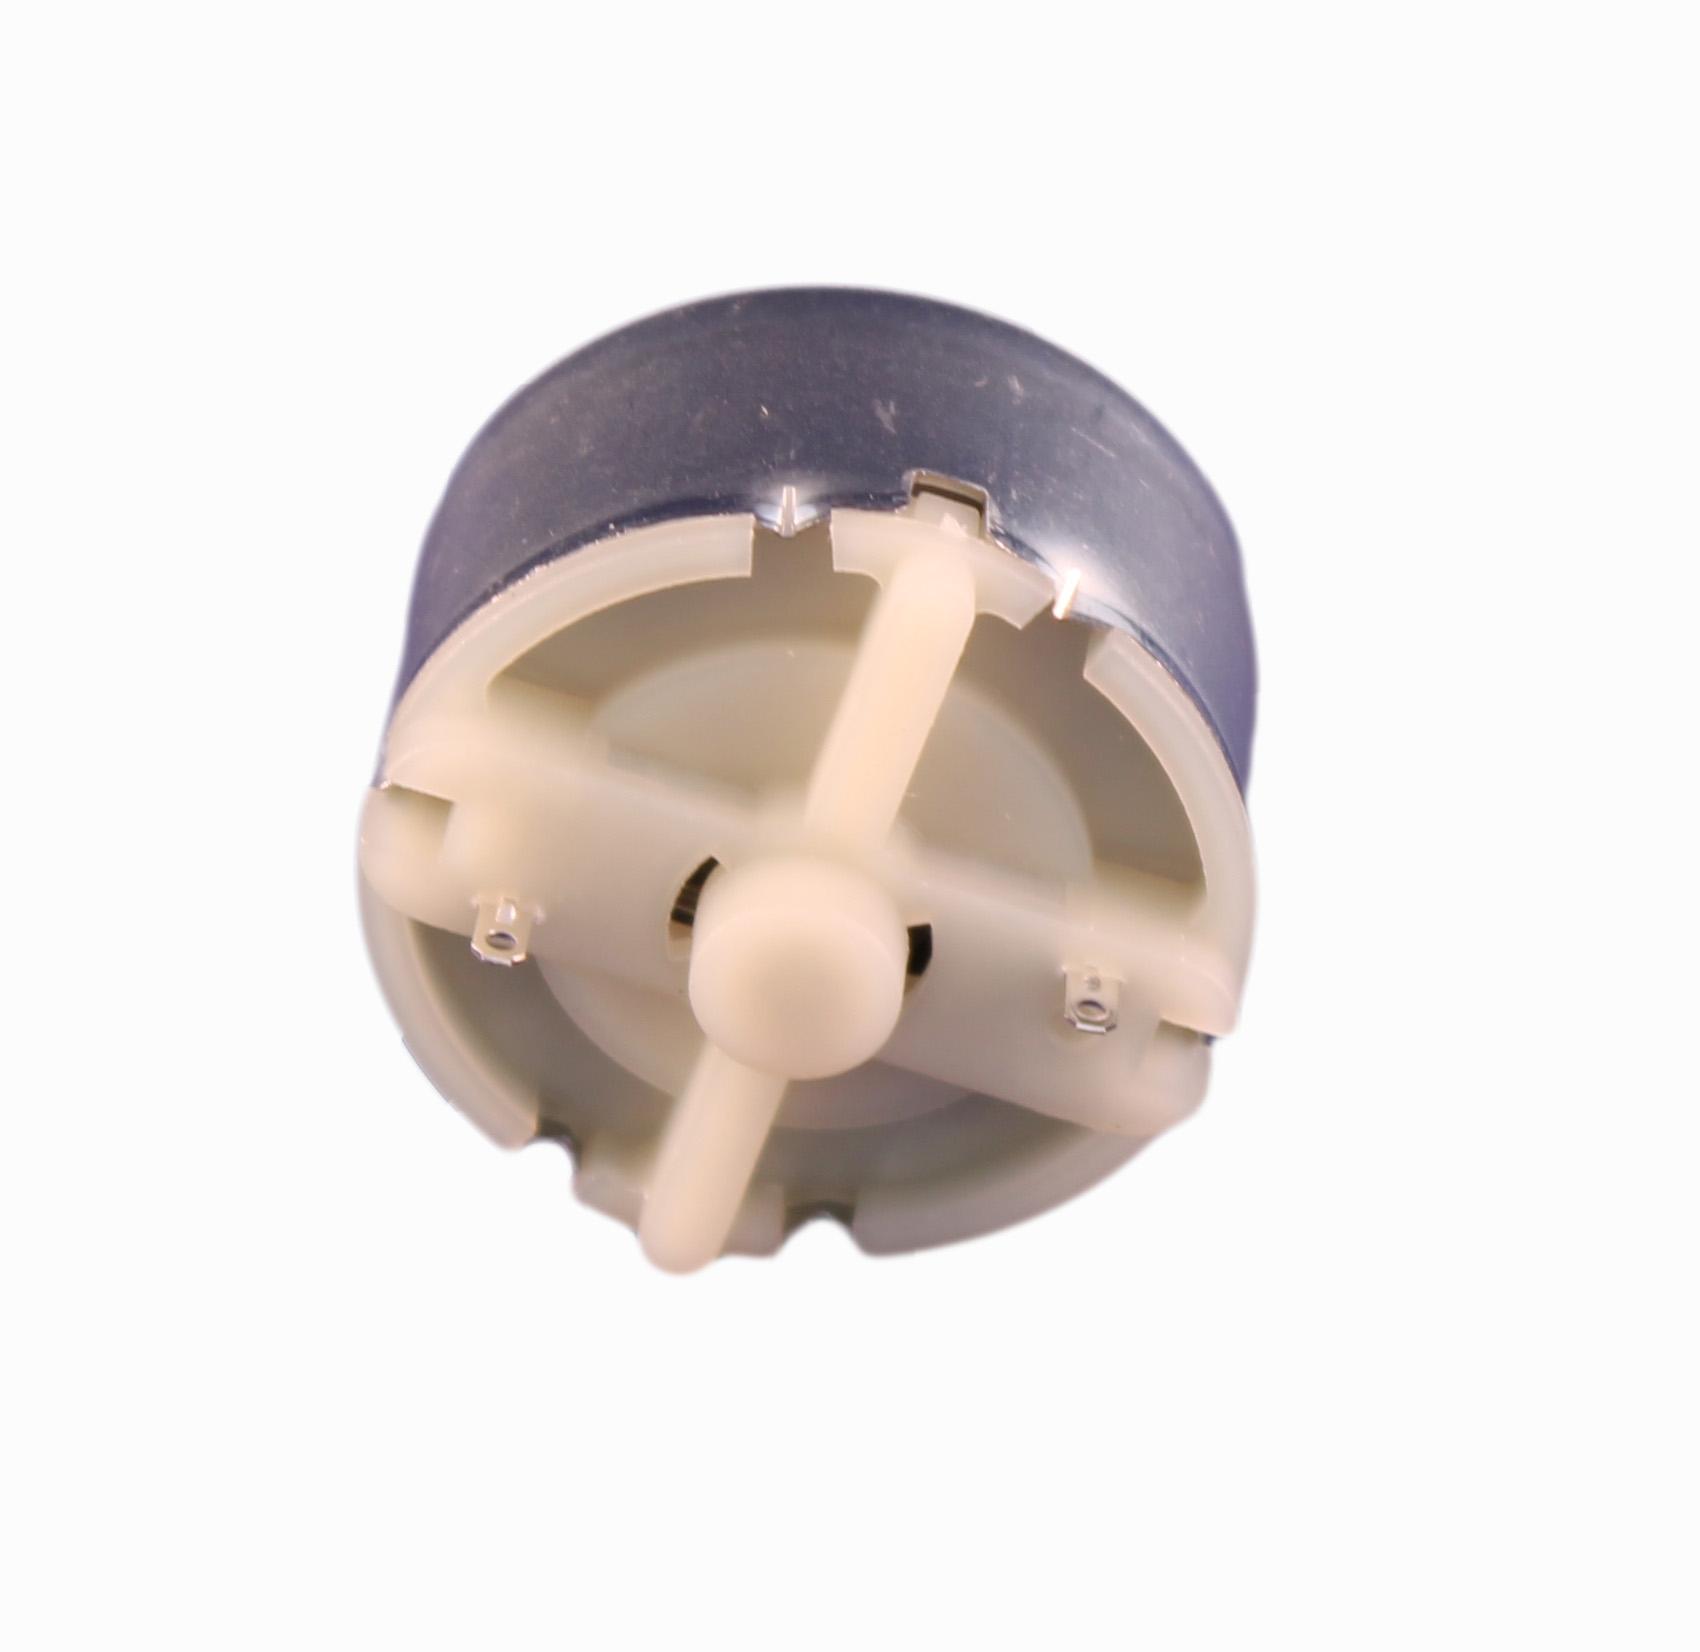 Motor Corriente DC, Voltaje 3.00V, R.P.M. 1300rpm - ARF-500 TB 12560 (Con eje grafilado)